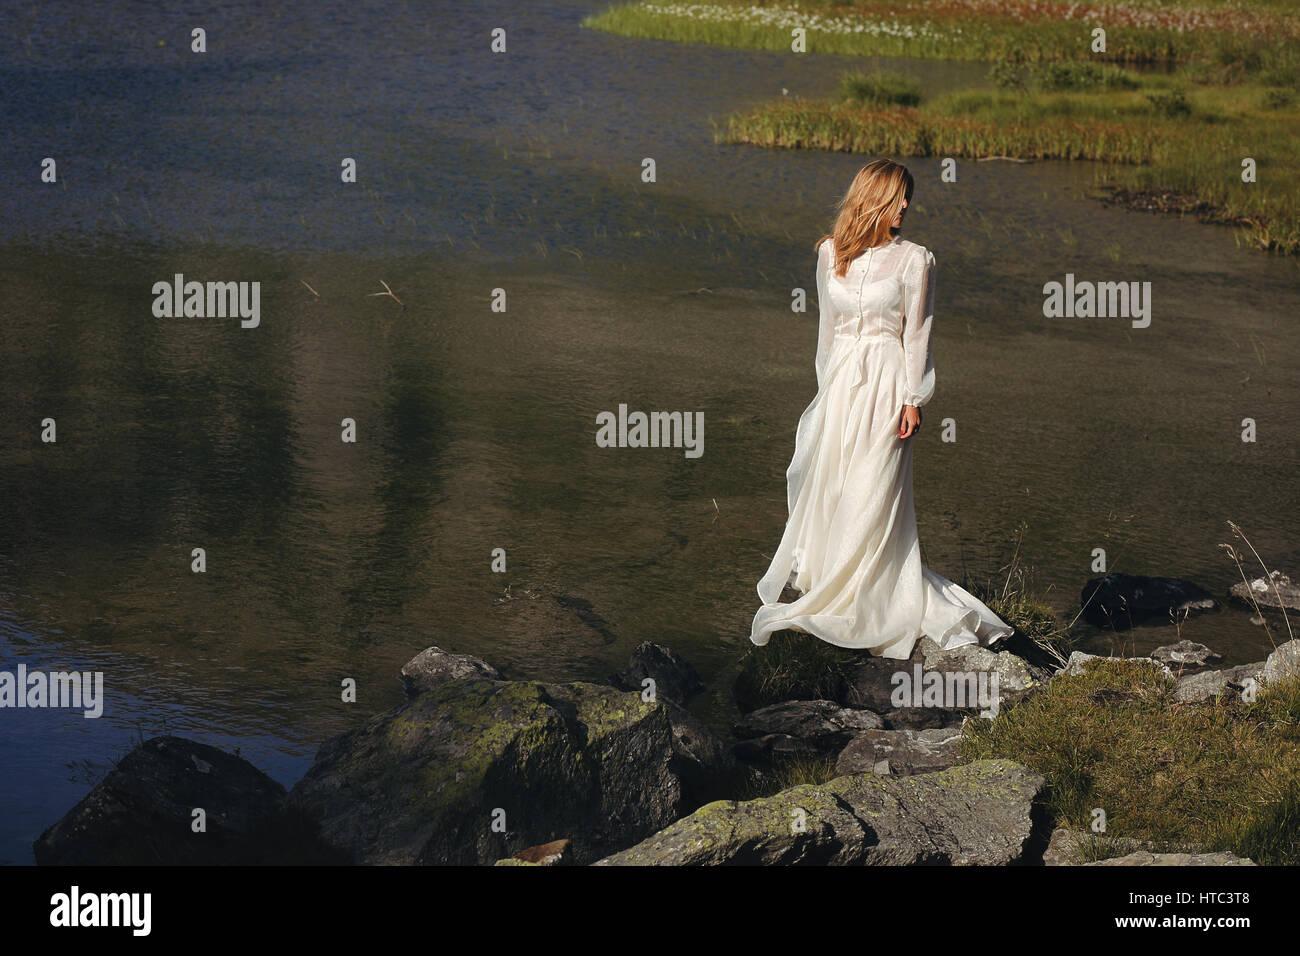 Triste novia posando en un lago de montaña. Romántica y soñadora Imagen De Stock